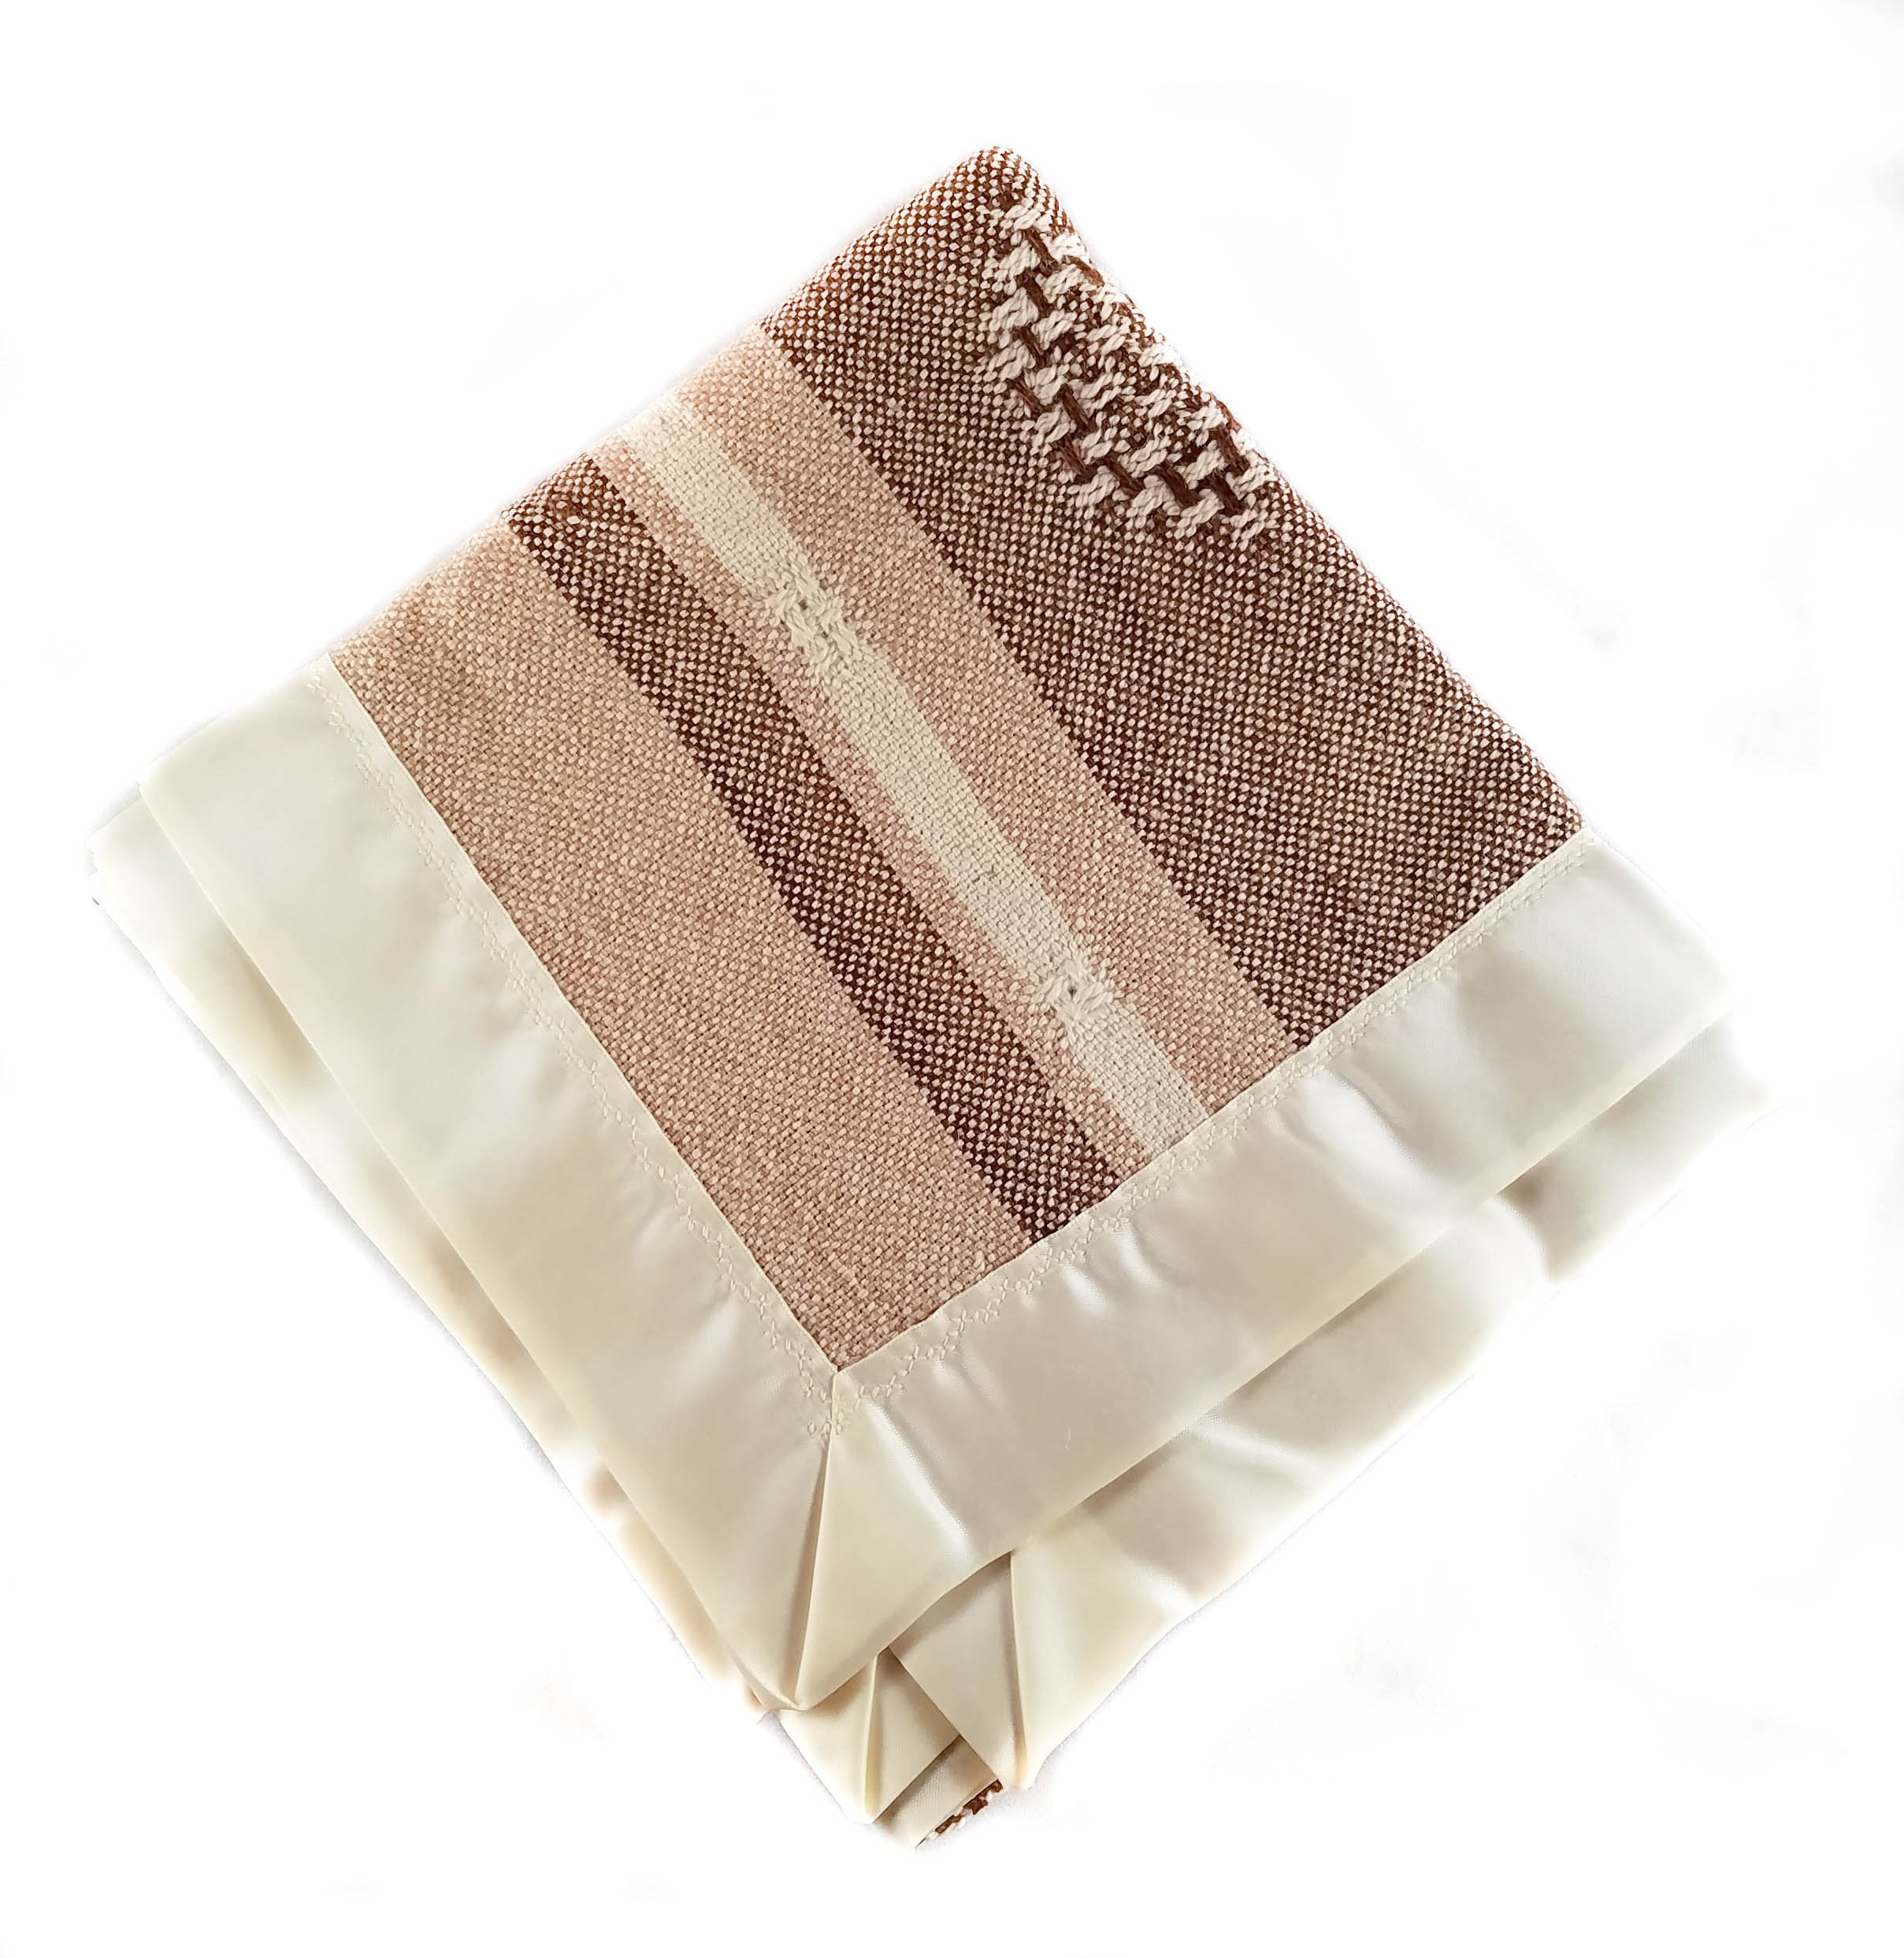 Baby Blanket For Boys Girls Unisex Blankets Alpaca Soft Satin Trim Gender Neutral Nursery Bedding Receiving Swaddling Infant Newborn